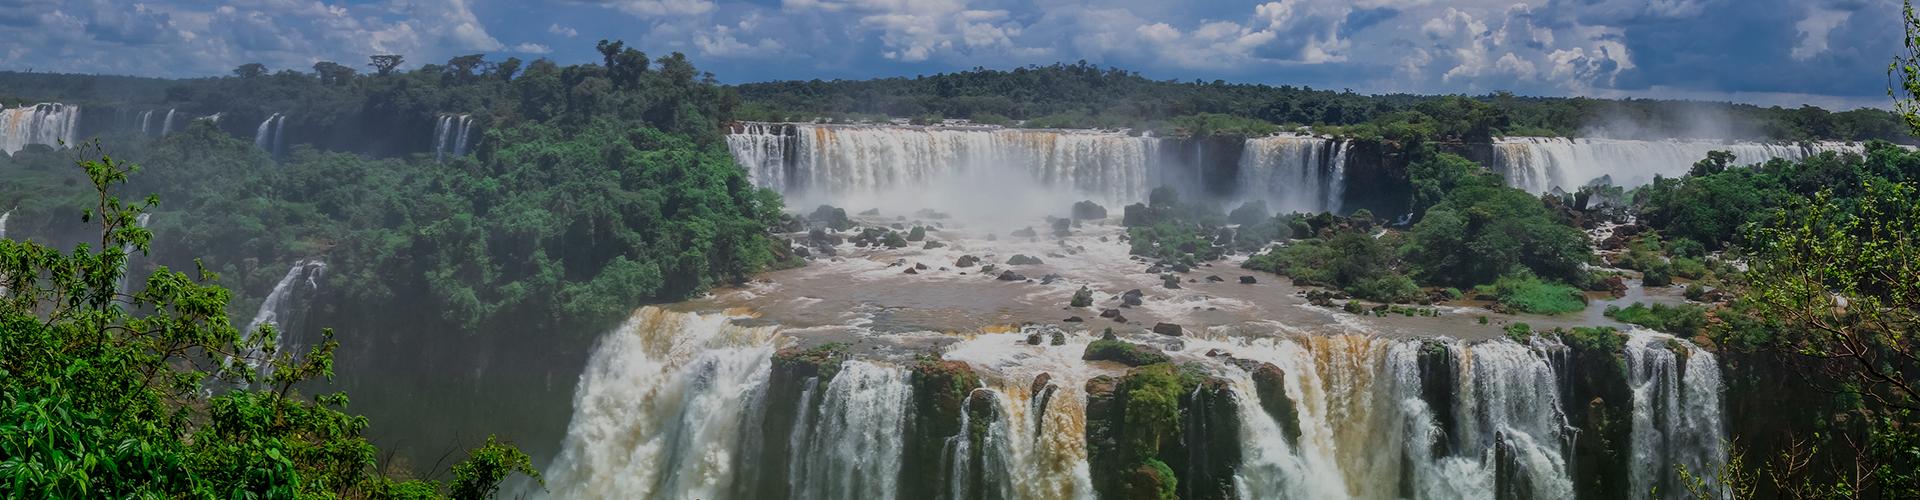 Landmark photograph of Paraguay